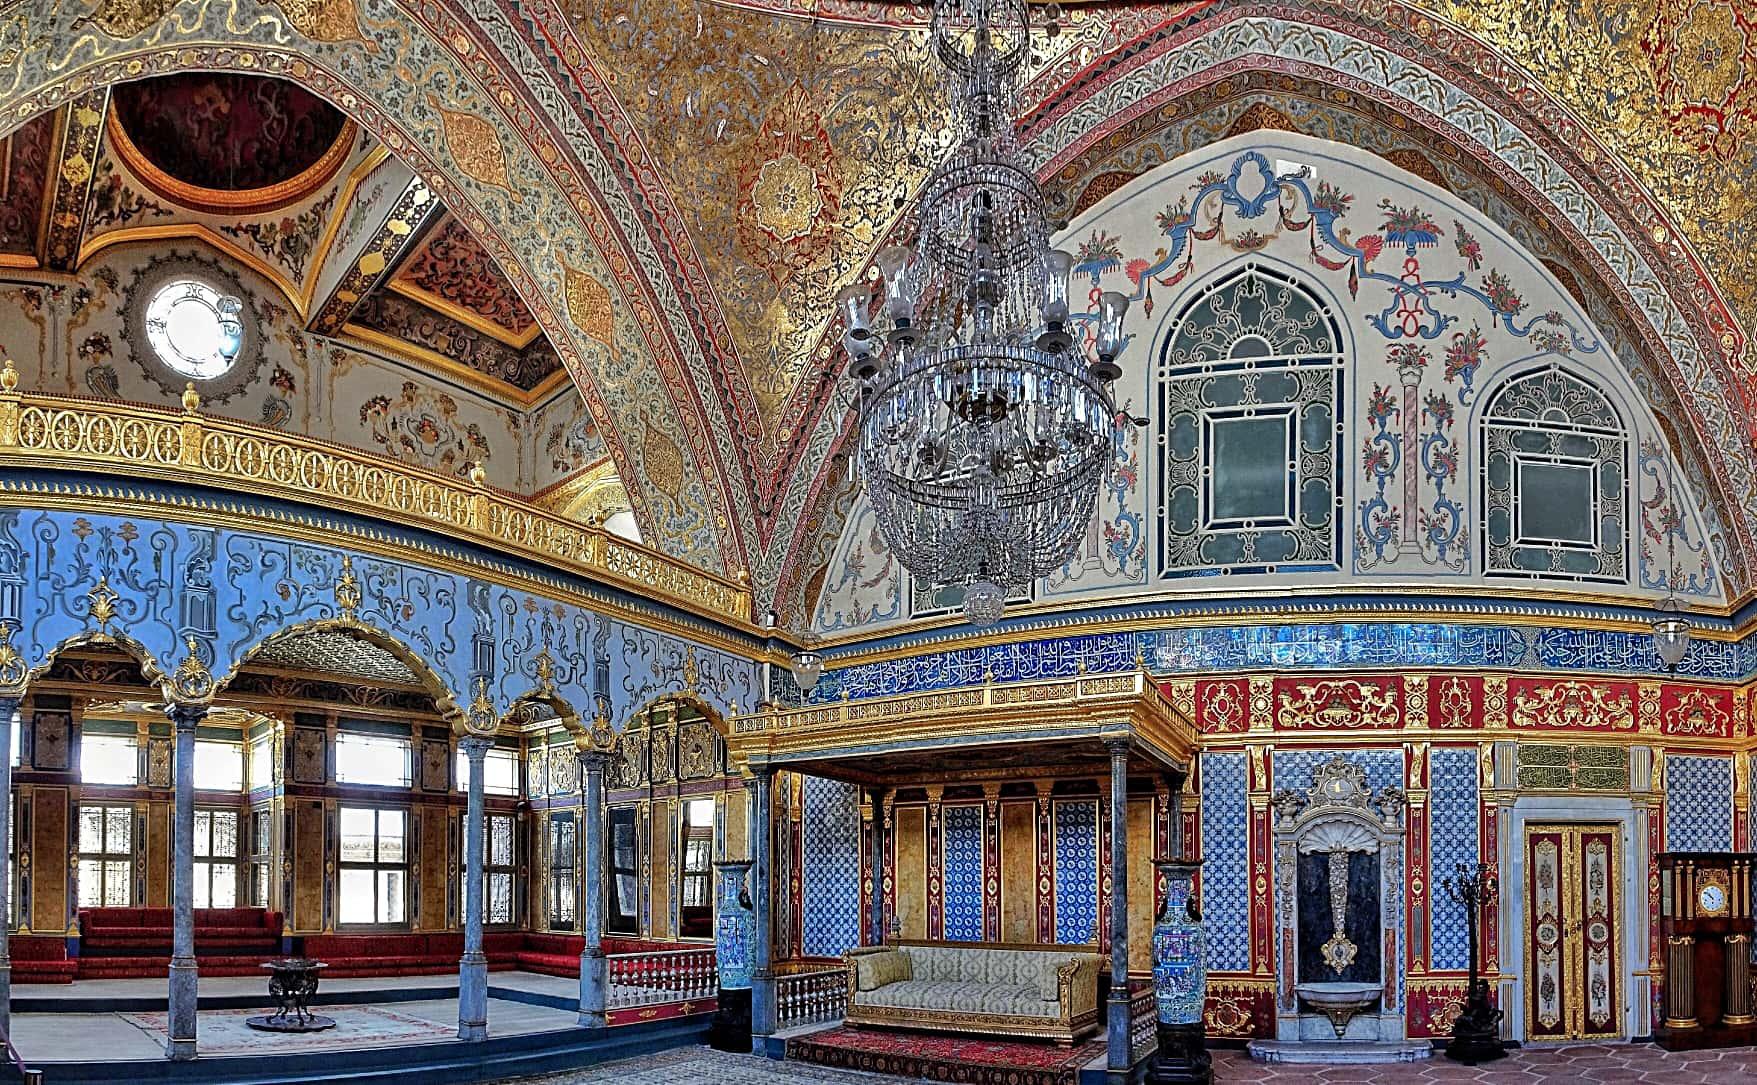 The Topkapi Harem, Istanbul, Turkey